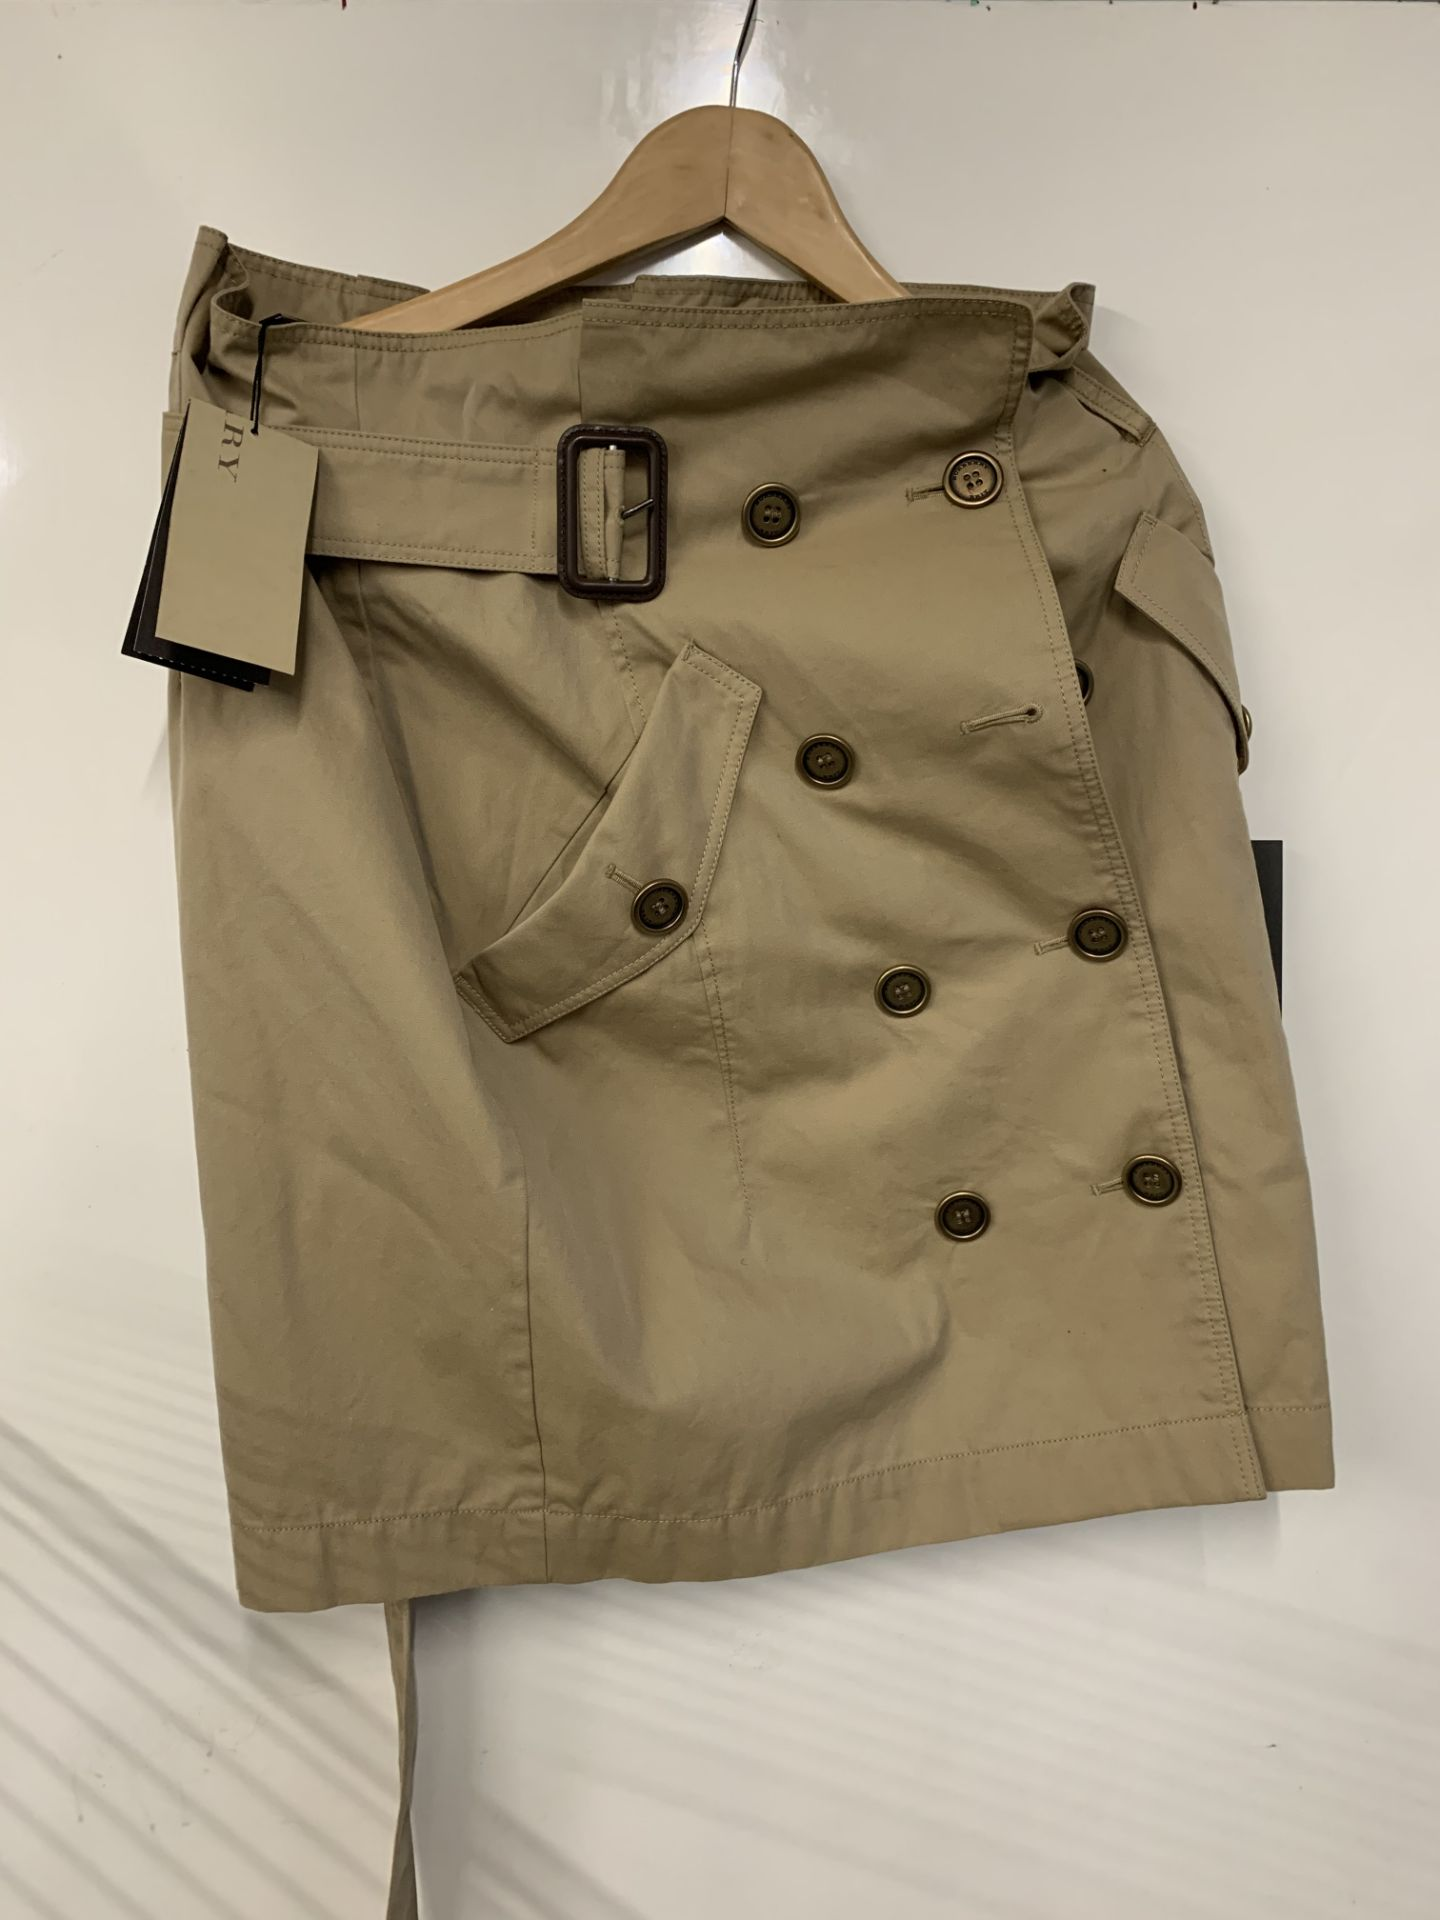 Lot 27 - Burberry Brit women's Natural Cotton Gabardine Trench Skirt